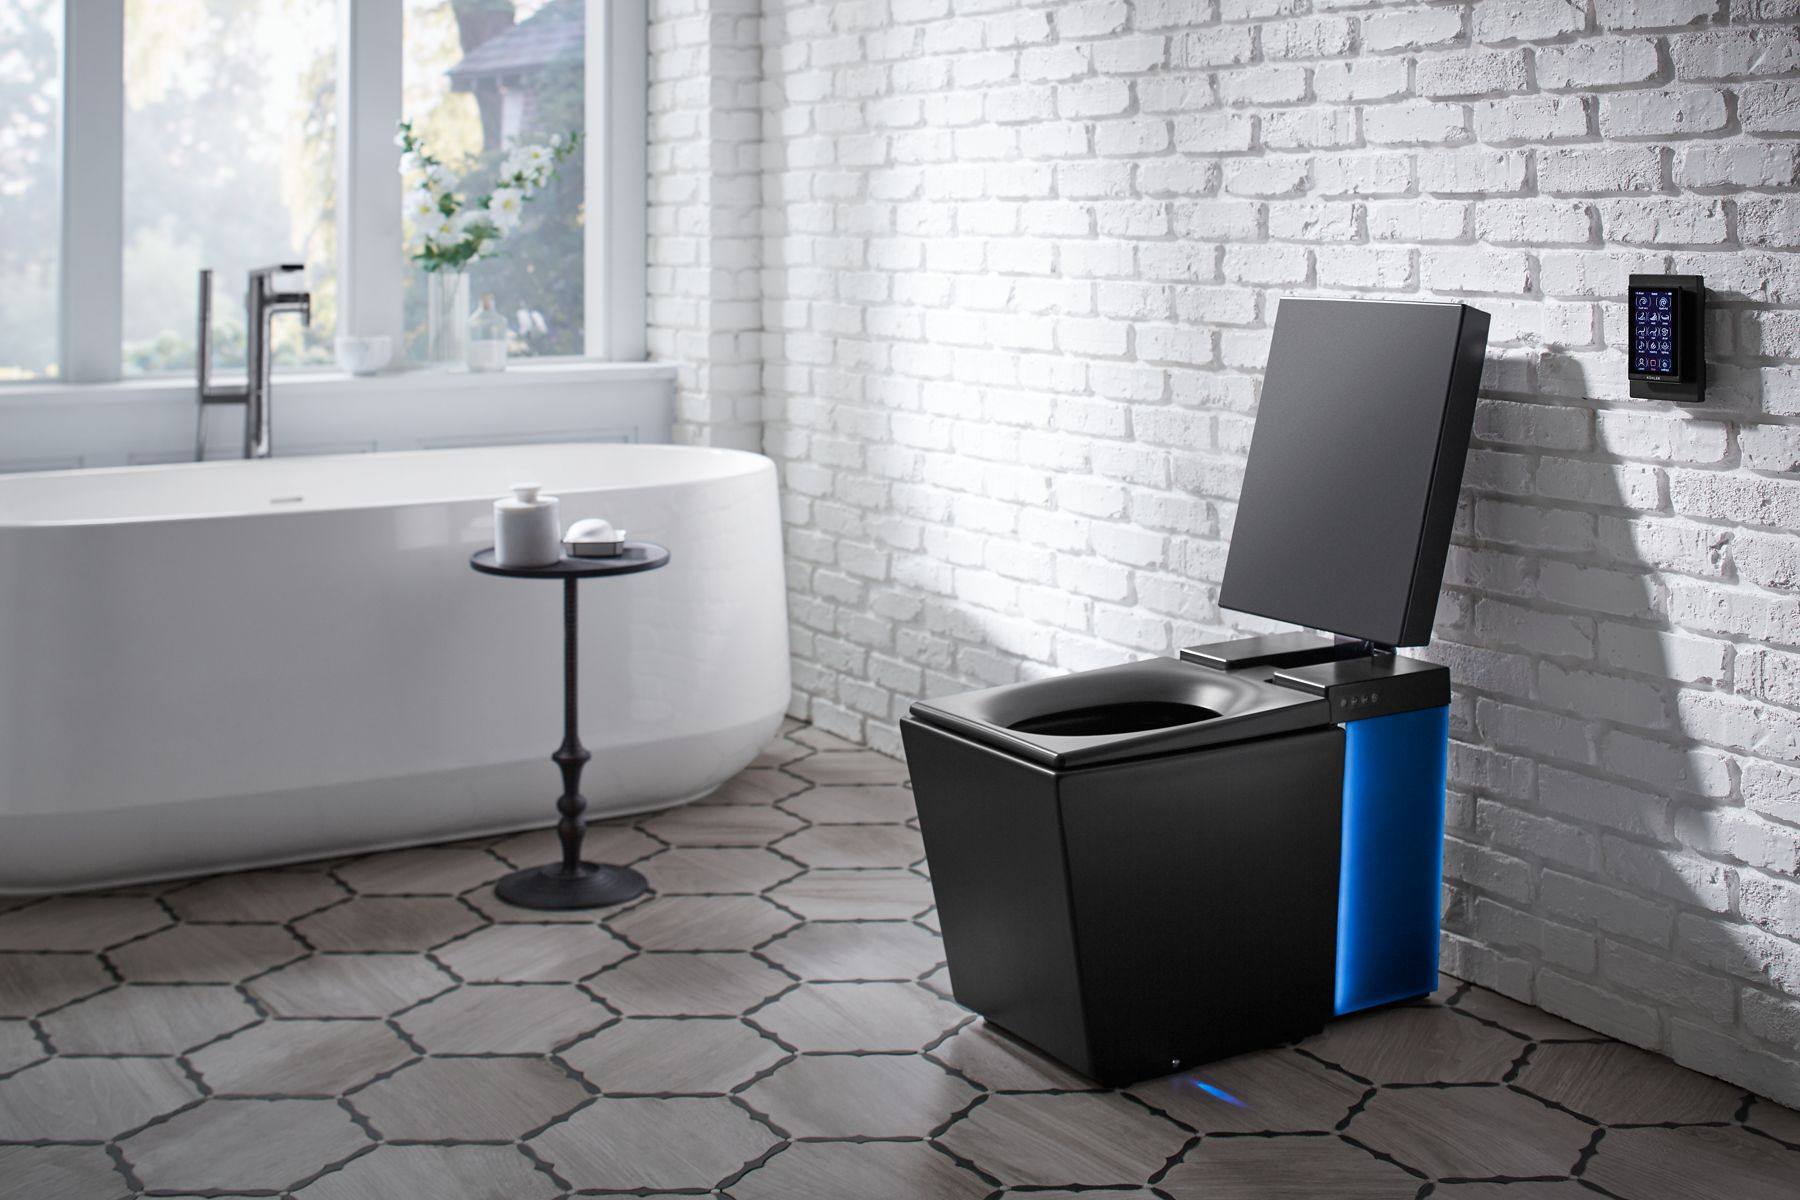 Numi Intelligent Toilet With Kohler Konnect Kohler